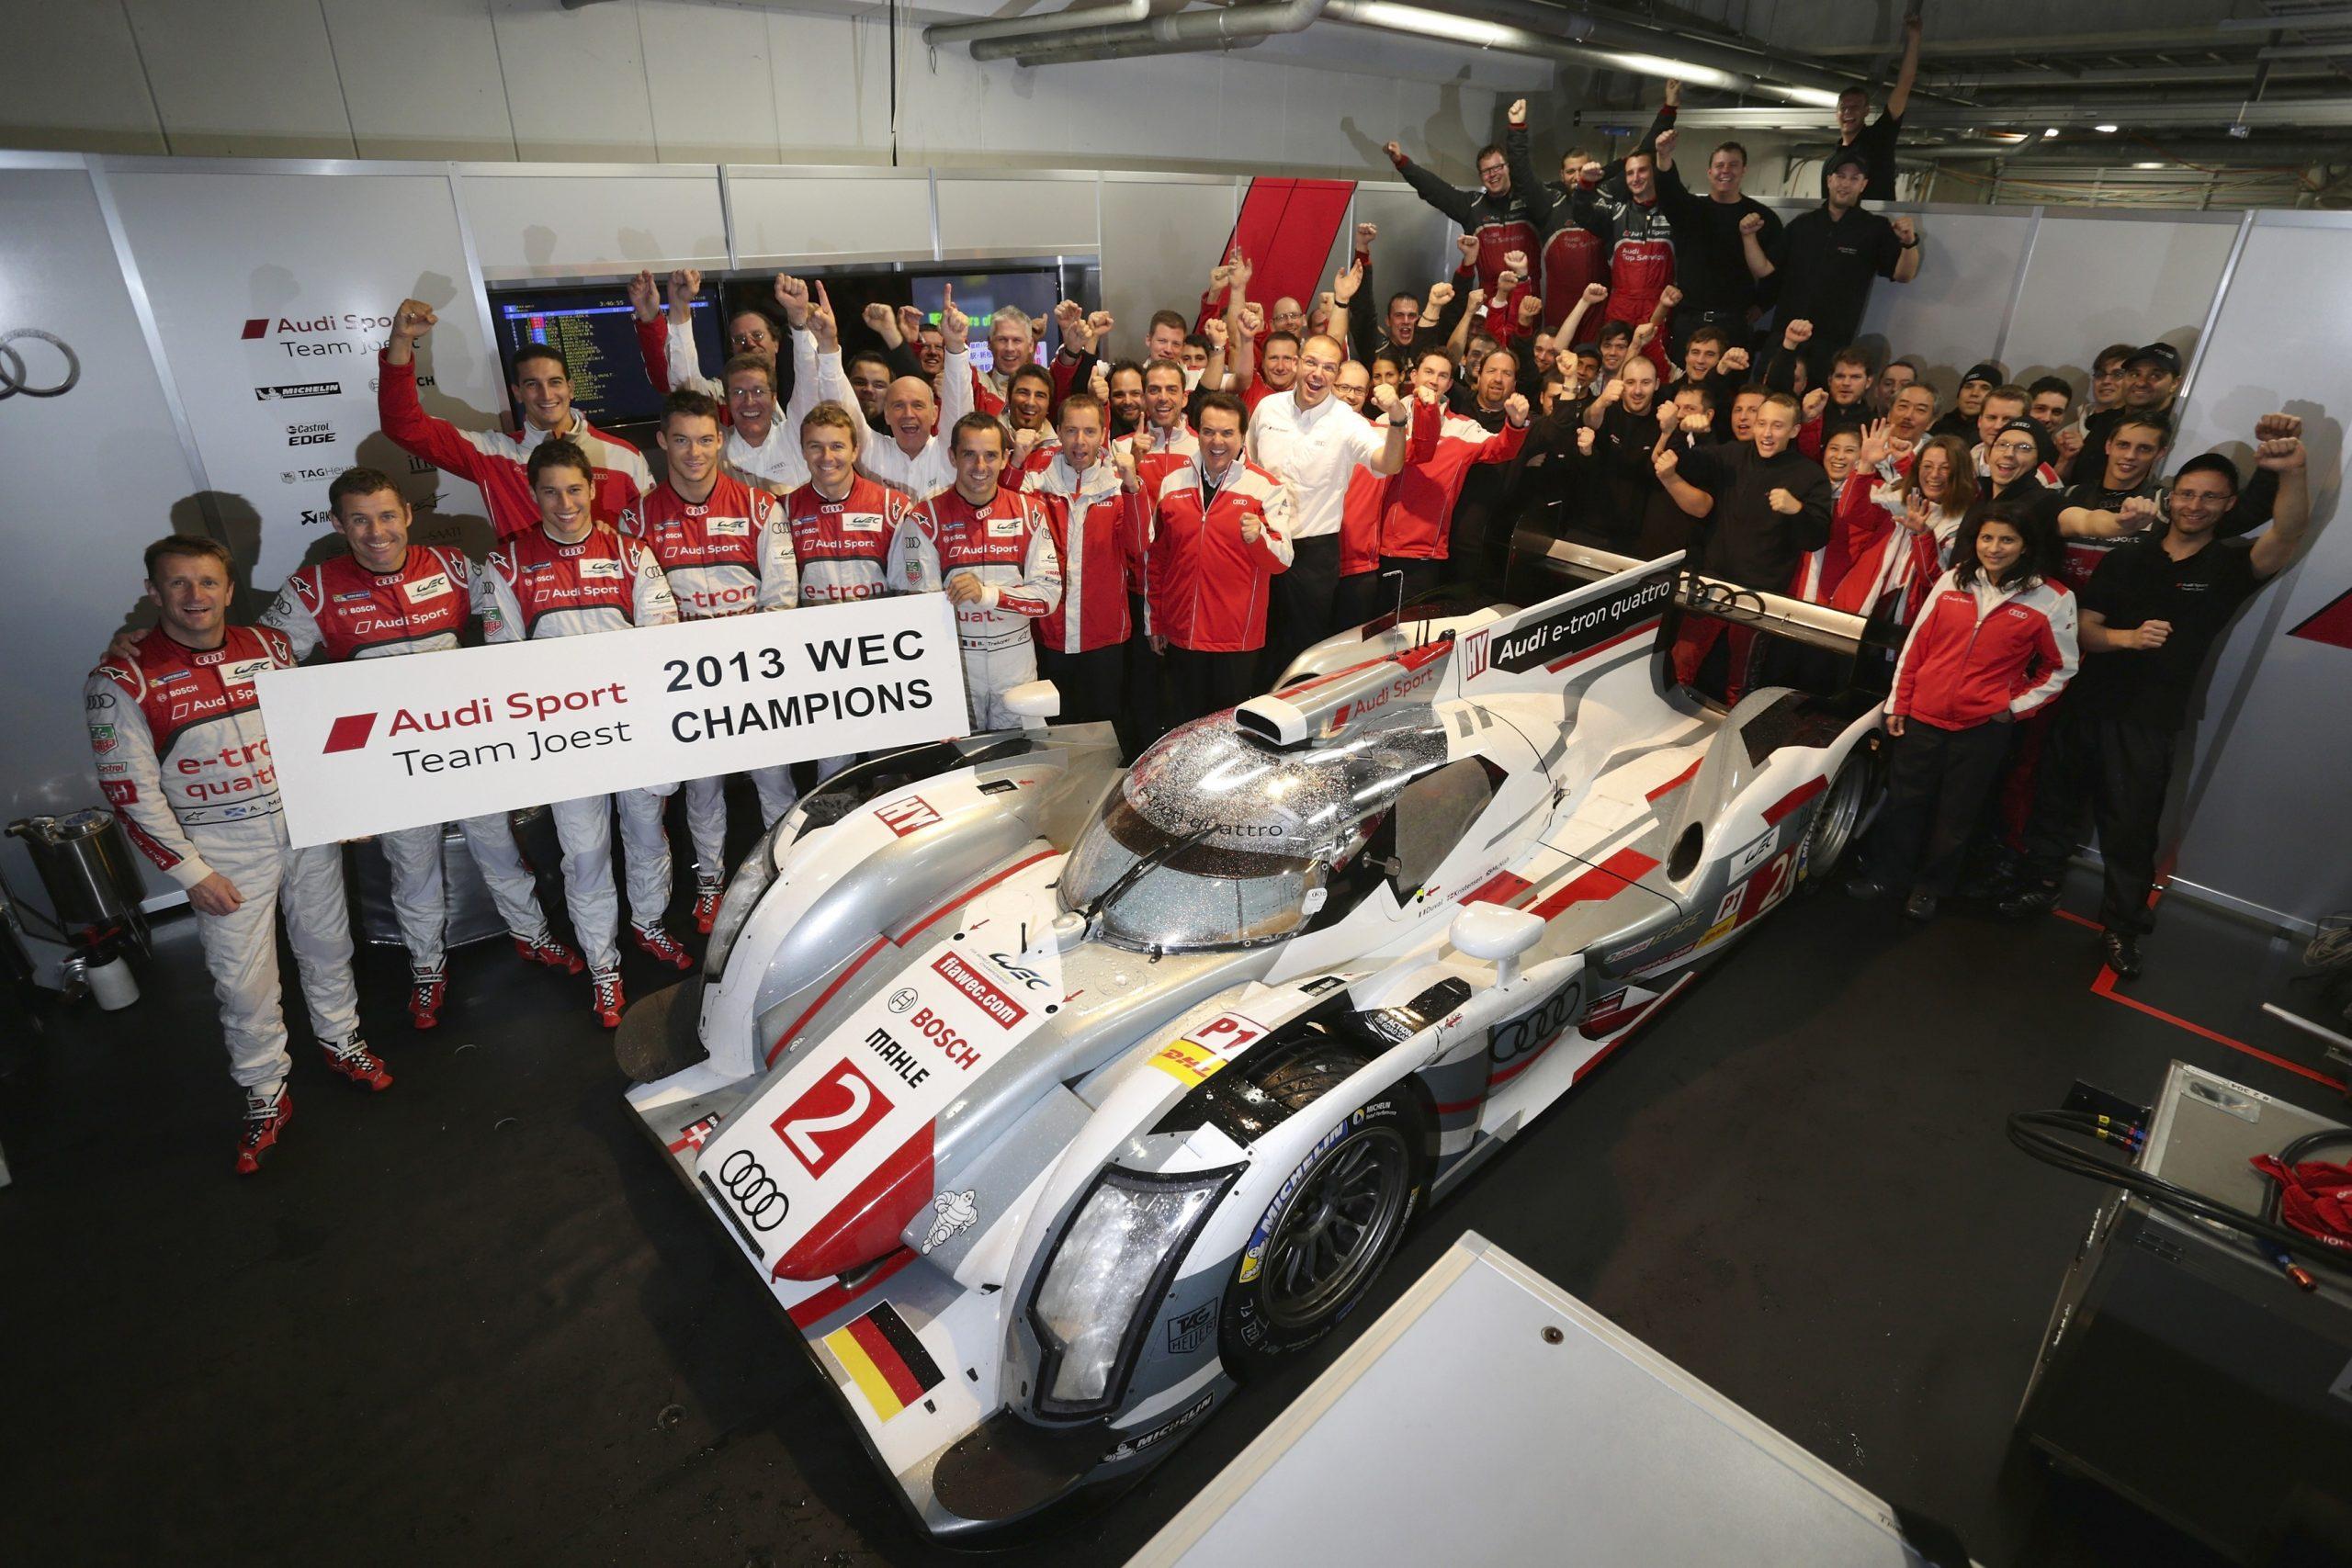 2013: Successful title defense in the FIA World Endurance Championship WEC